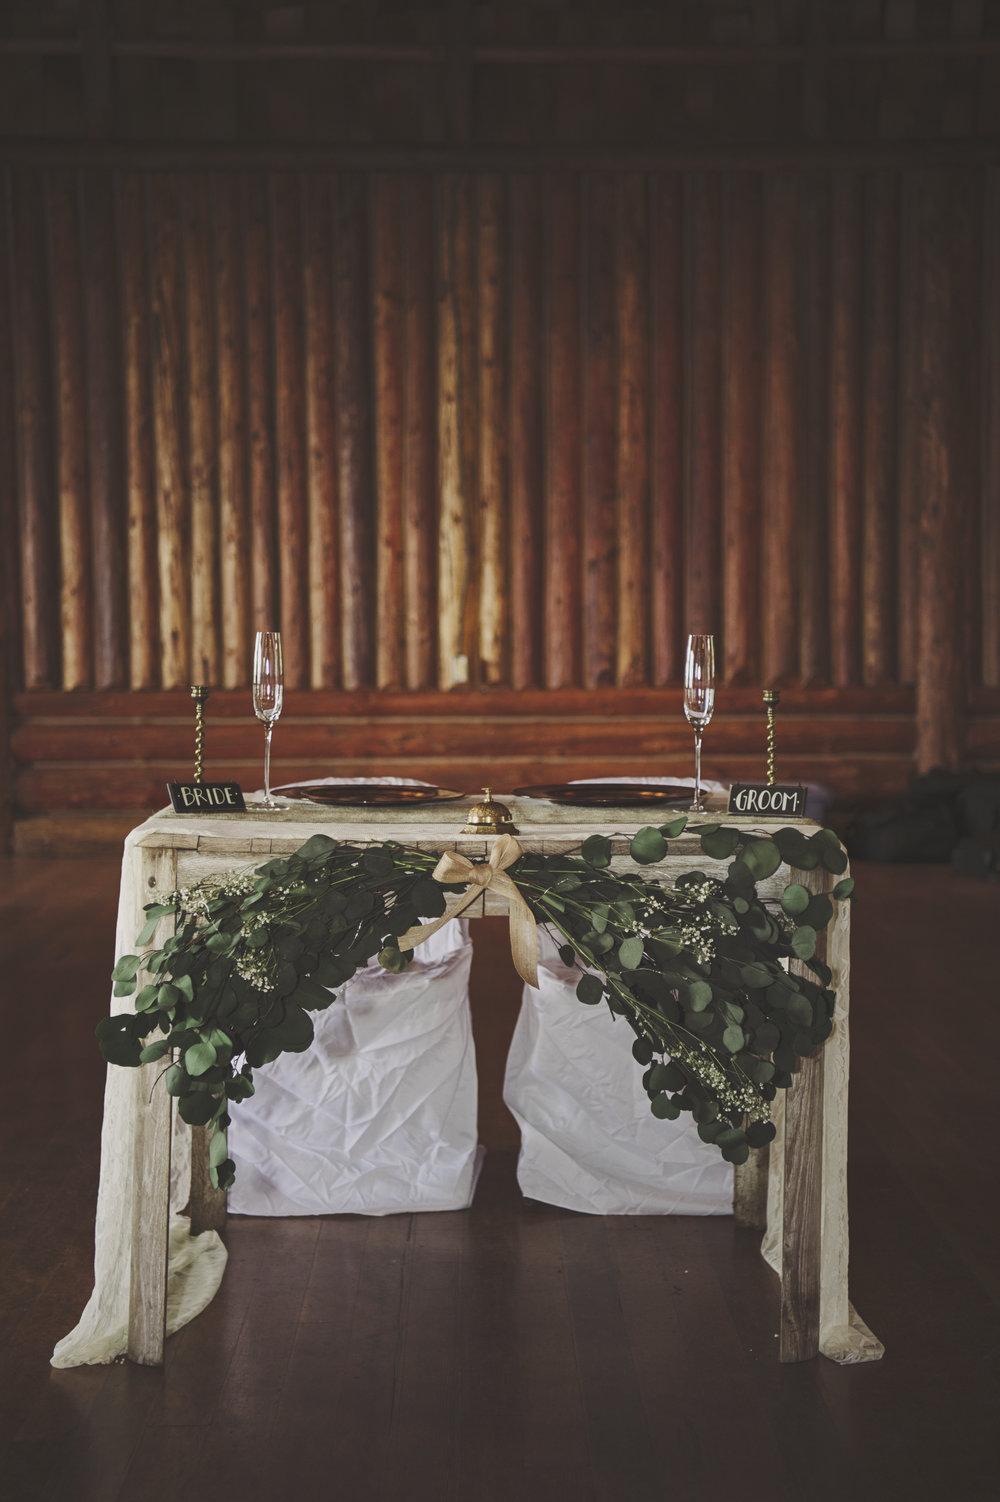 Woodsy Wedding_Kitsap Memorial State Park Wedding_Kelsey Lane Photography_bride and groom table